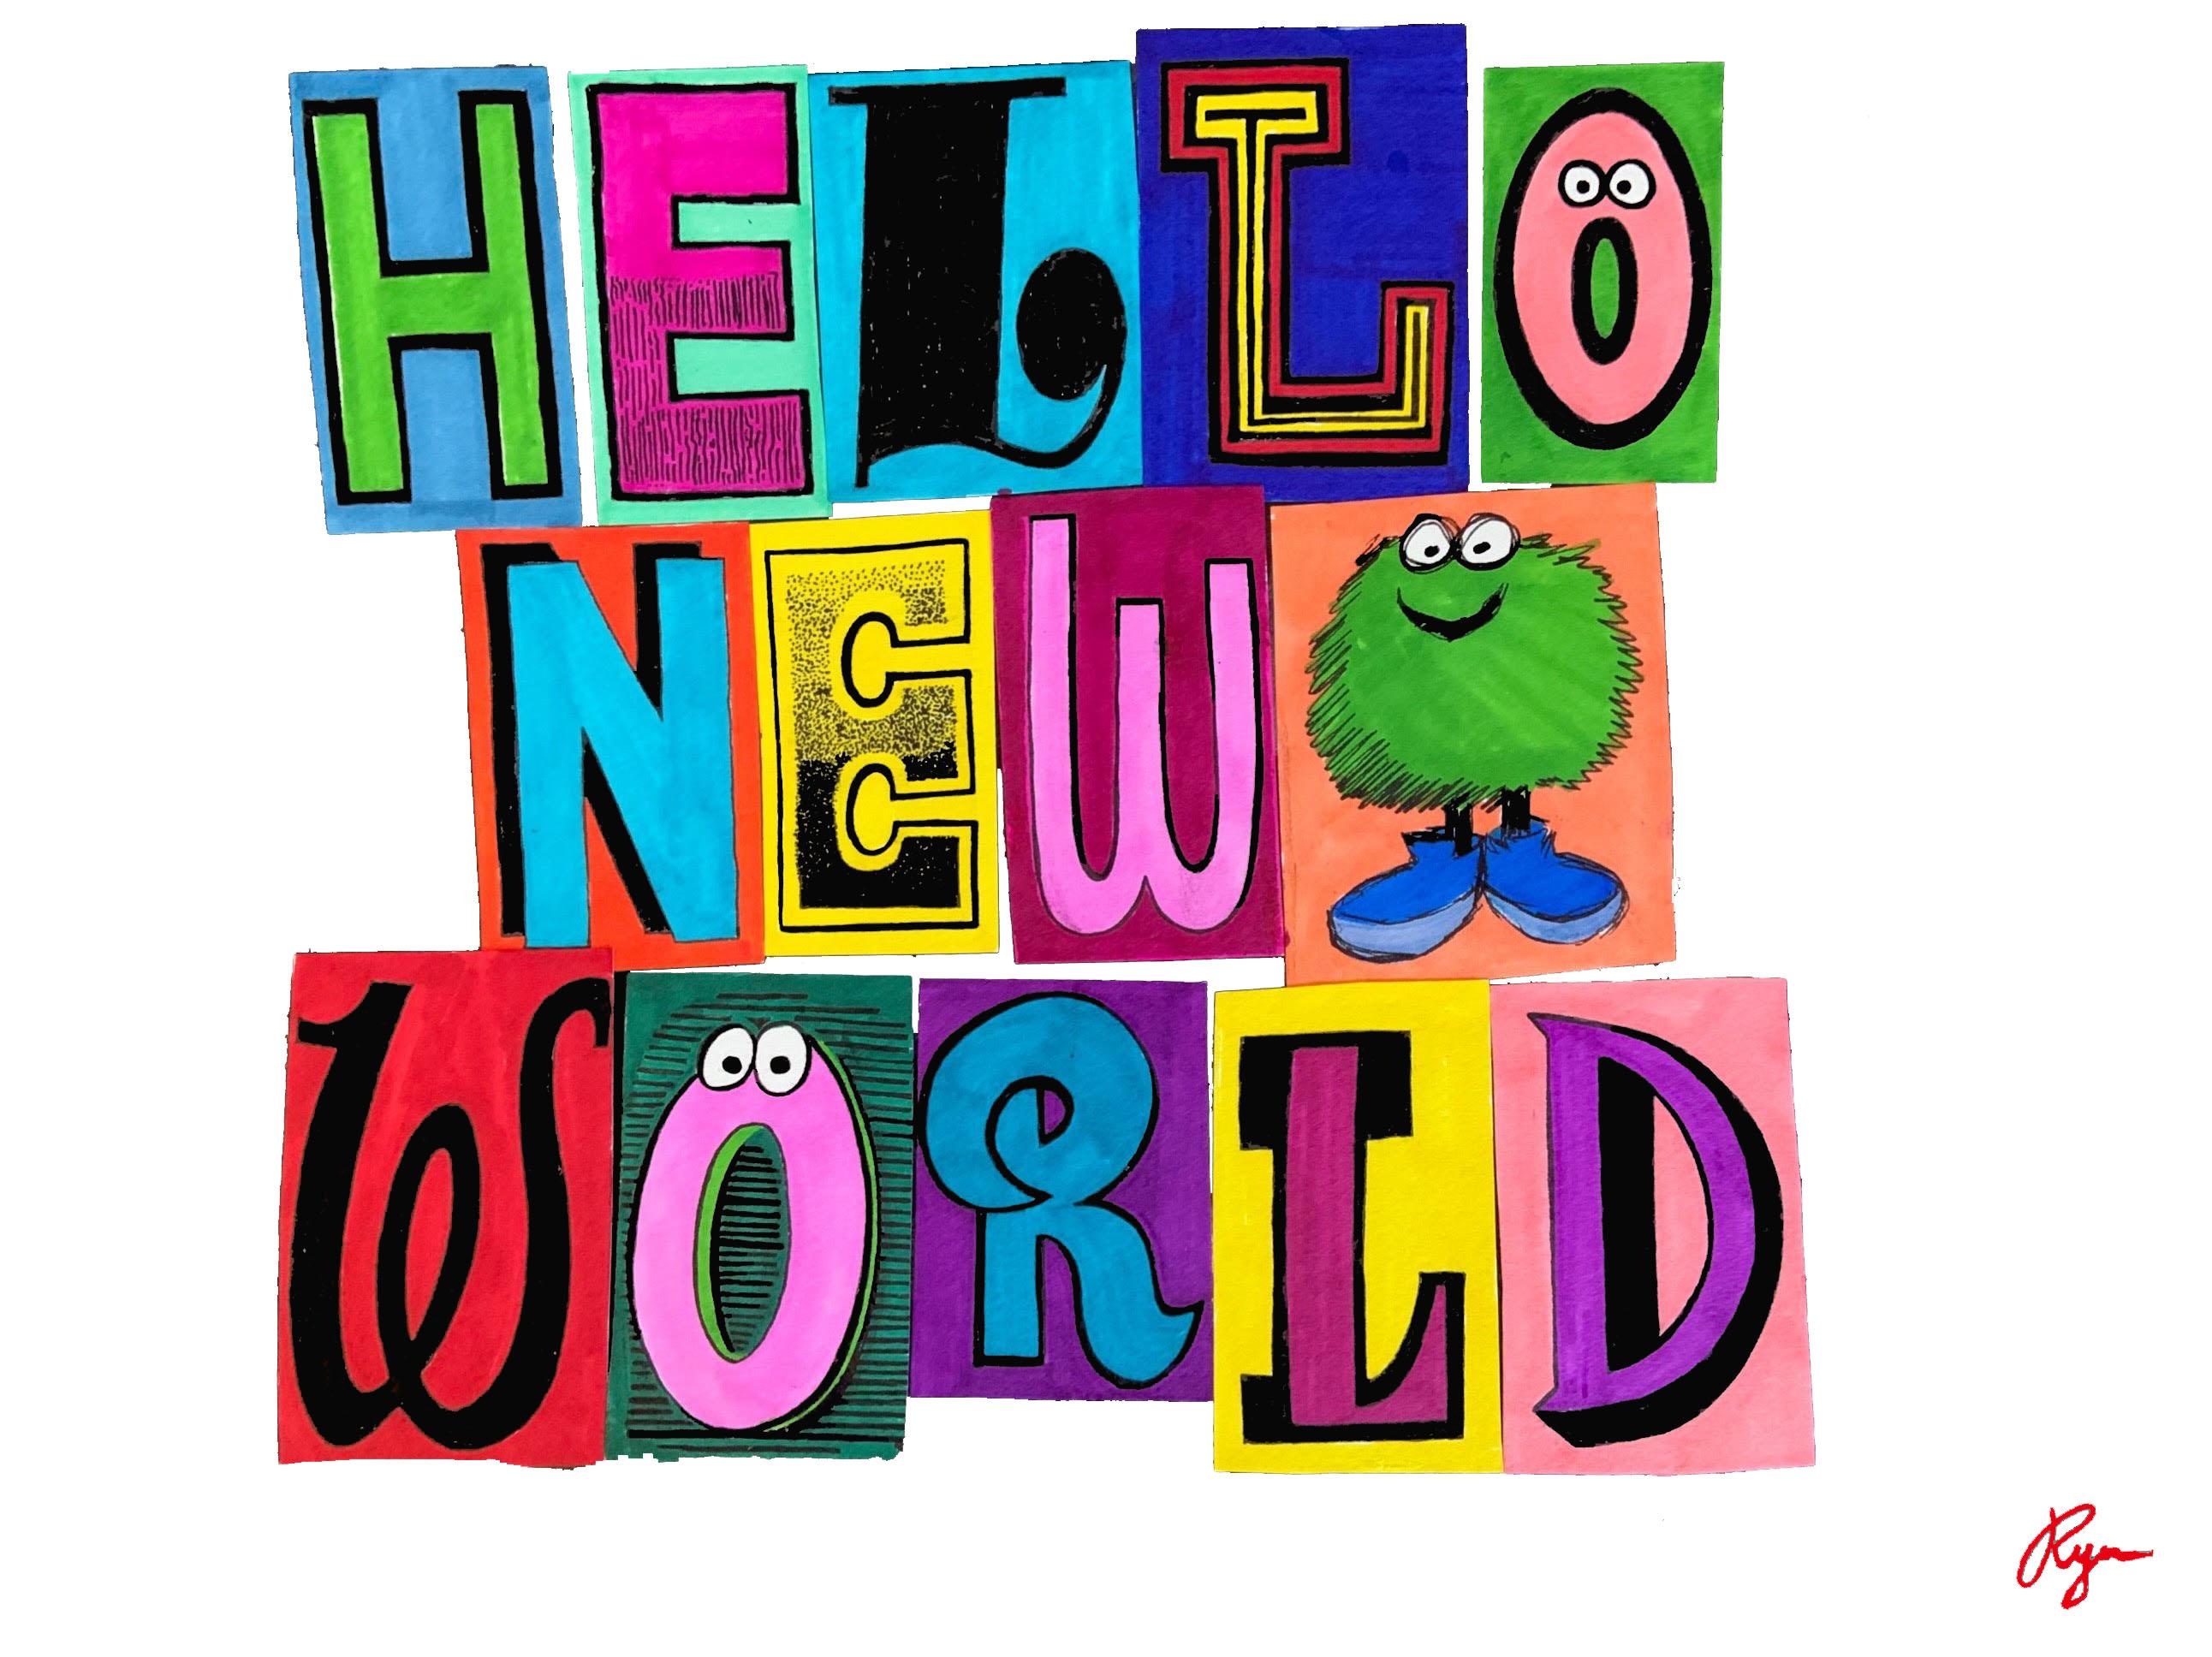 ryu-ambe-exhibition-hello-new-worldat-estinate-hotel1-2